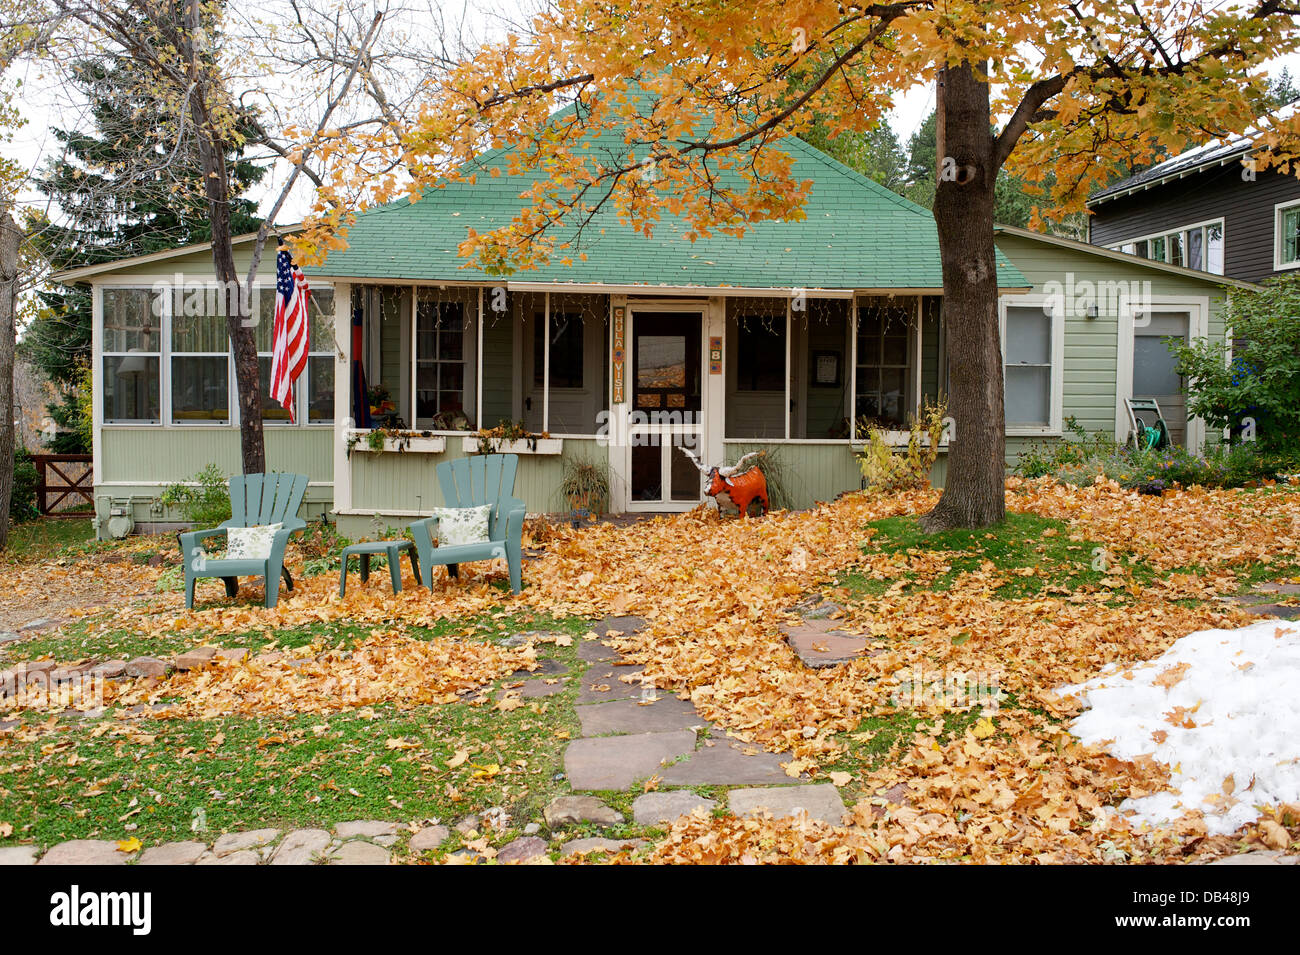 Peachy Cottage Chautauqua Boulder Colorado Usa Stock Photo Download Free Architecture Designs Terstmadebymaigaardcom